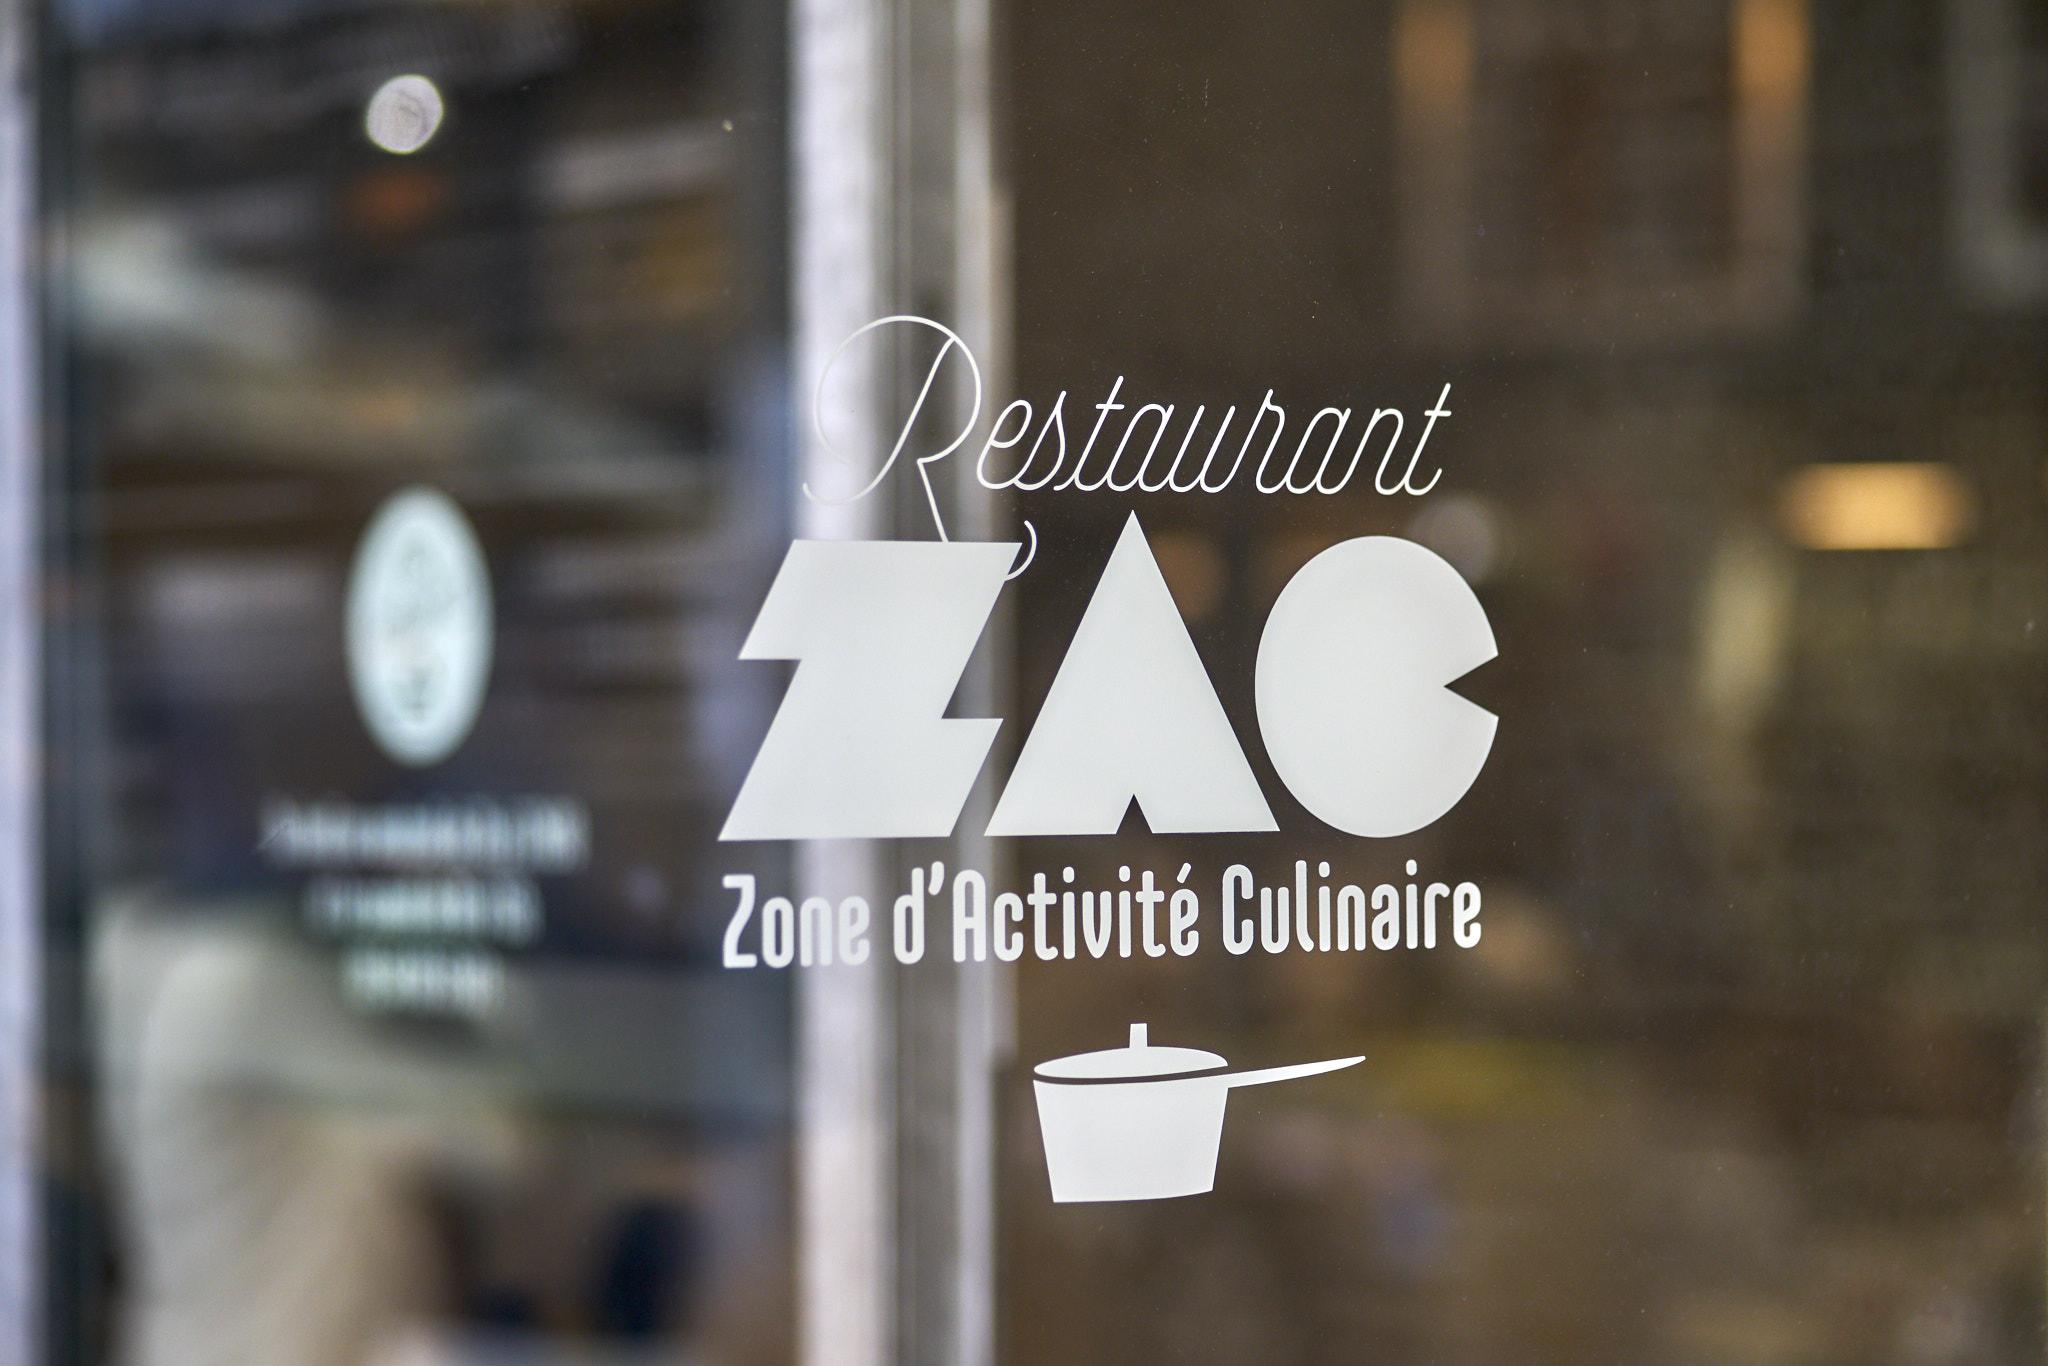 Restaurant ZAC - Reportage 5